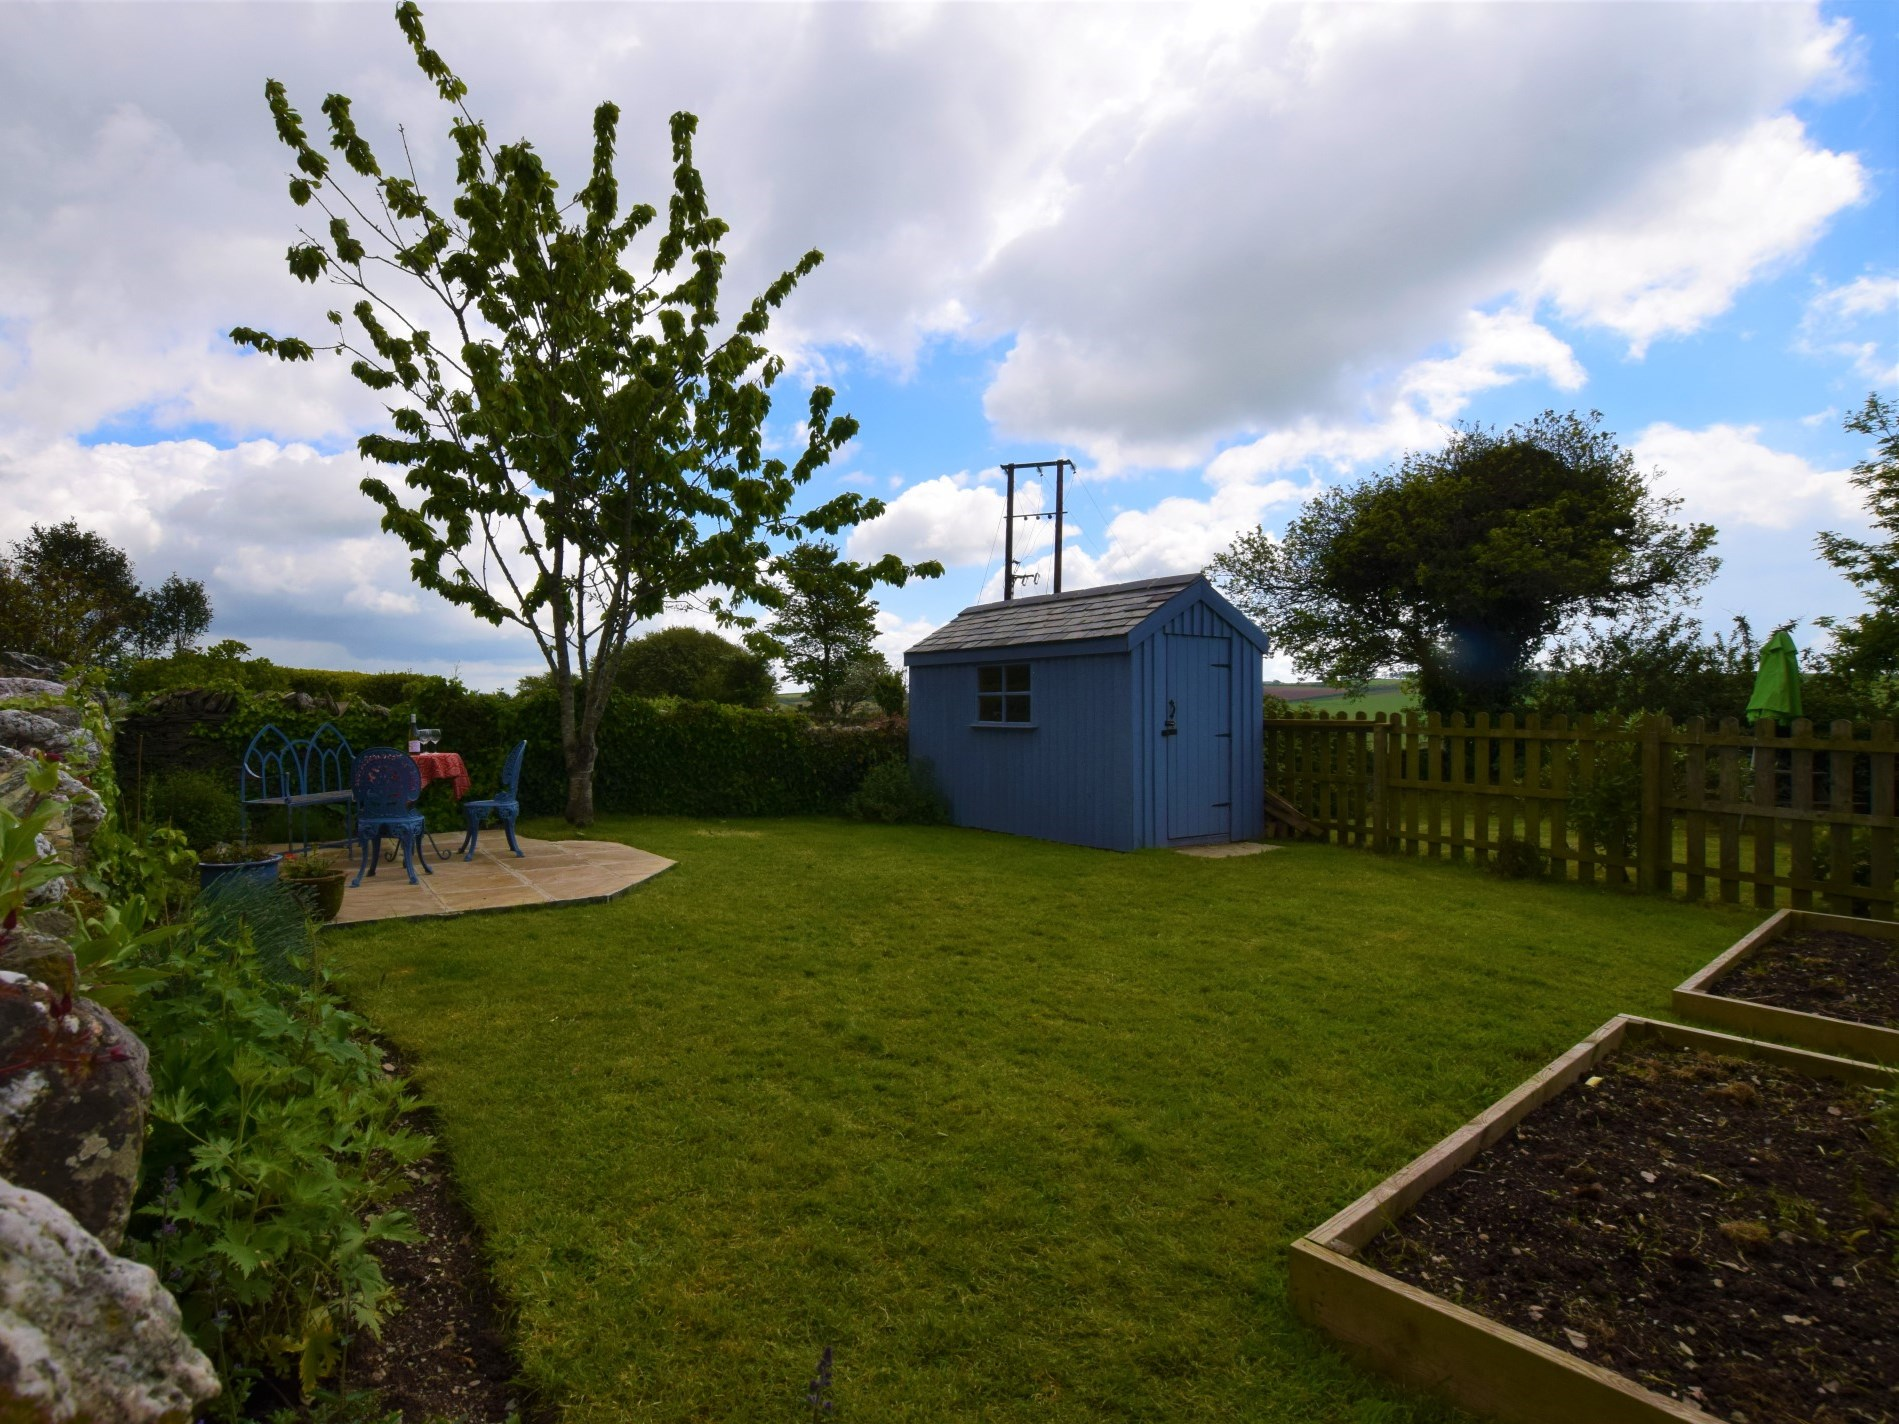 Lovely enclosed garden